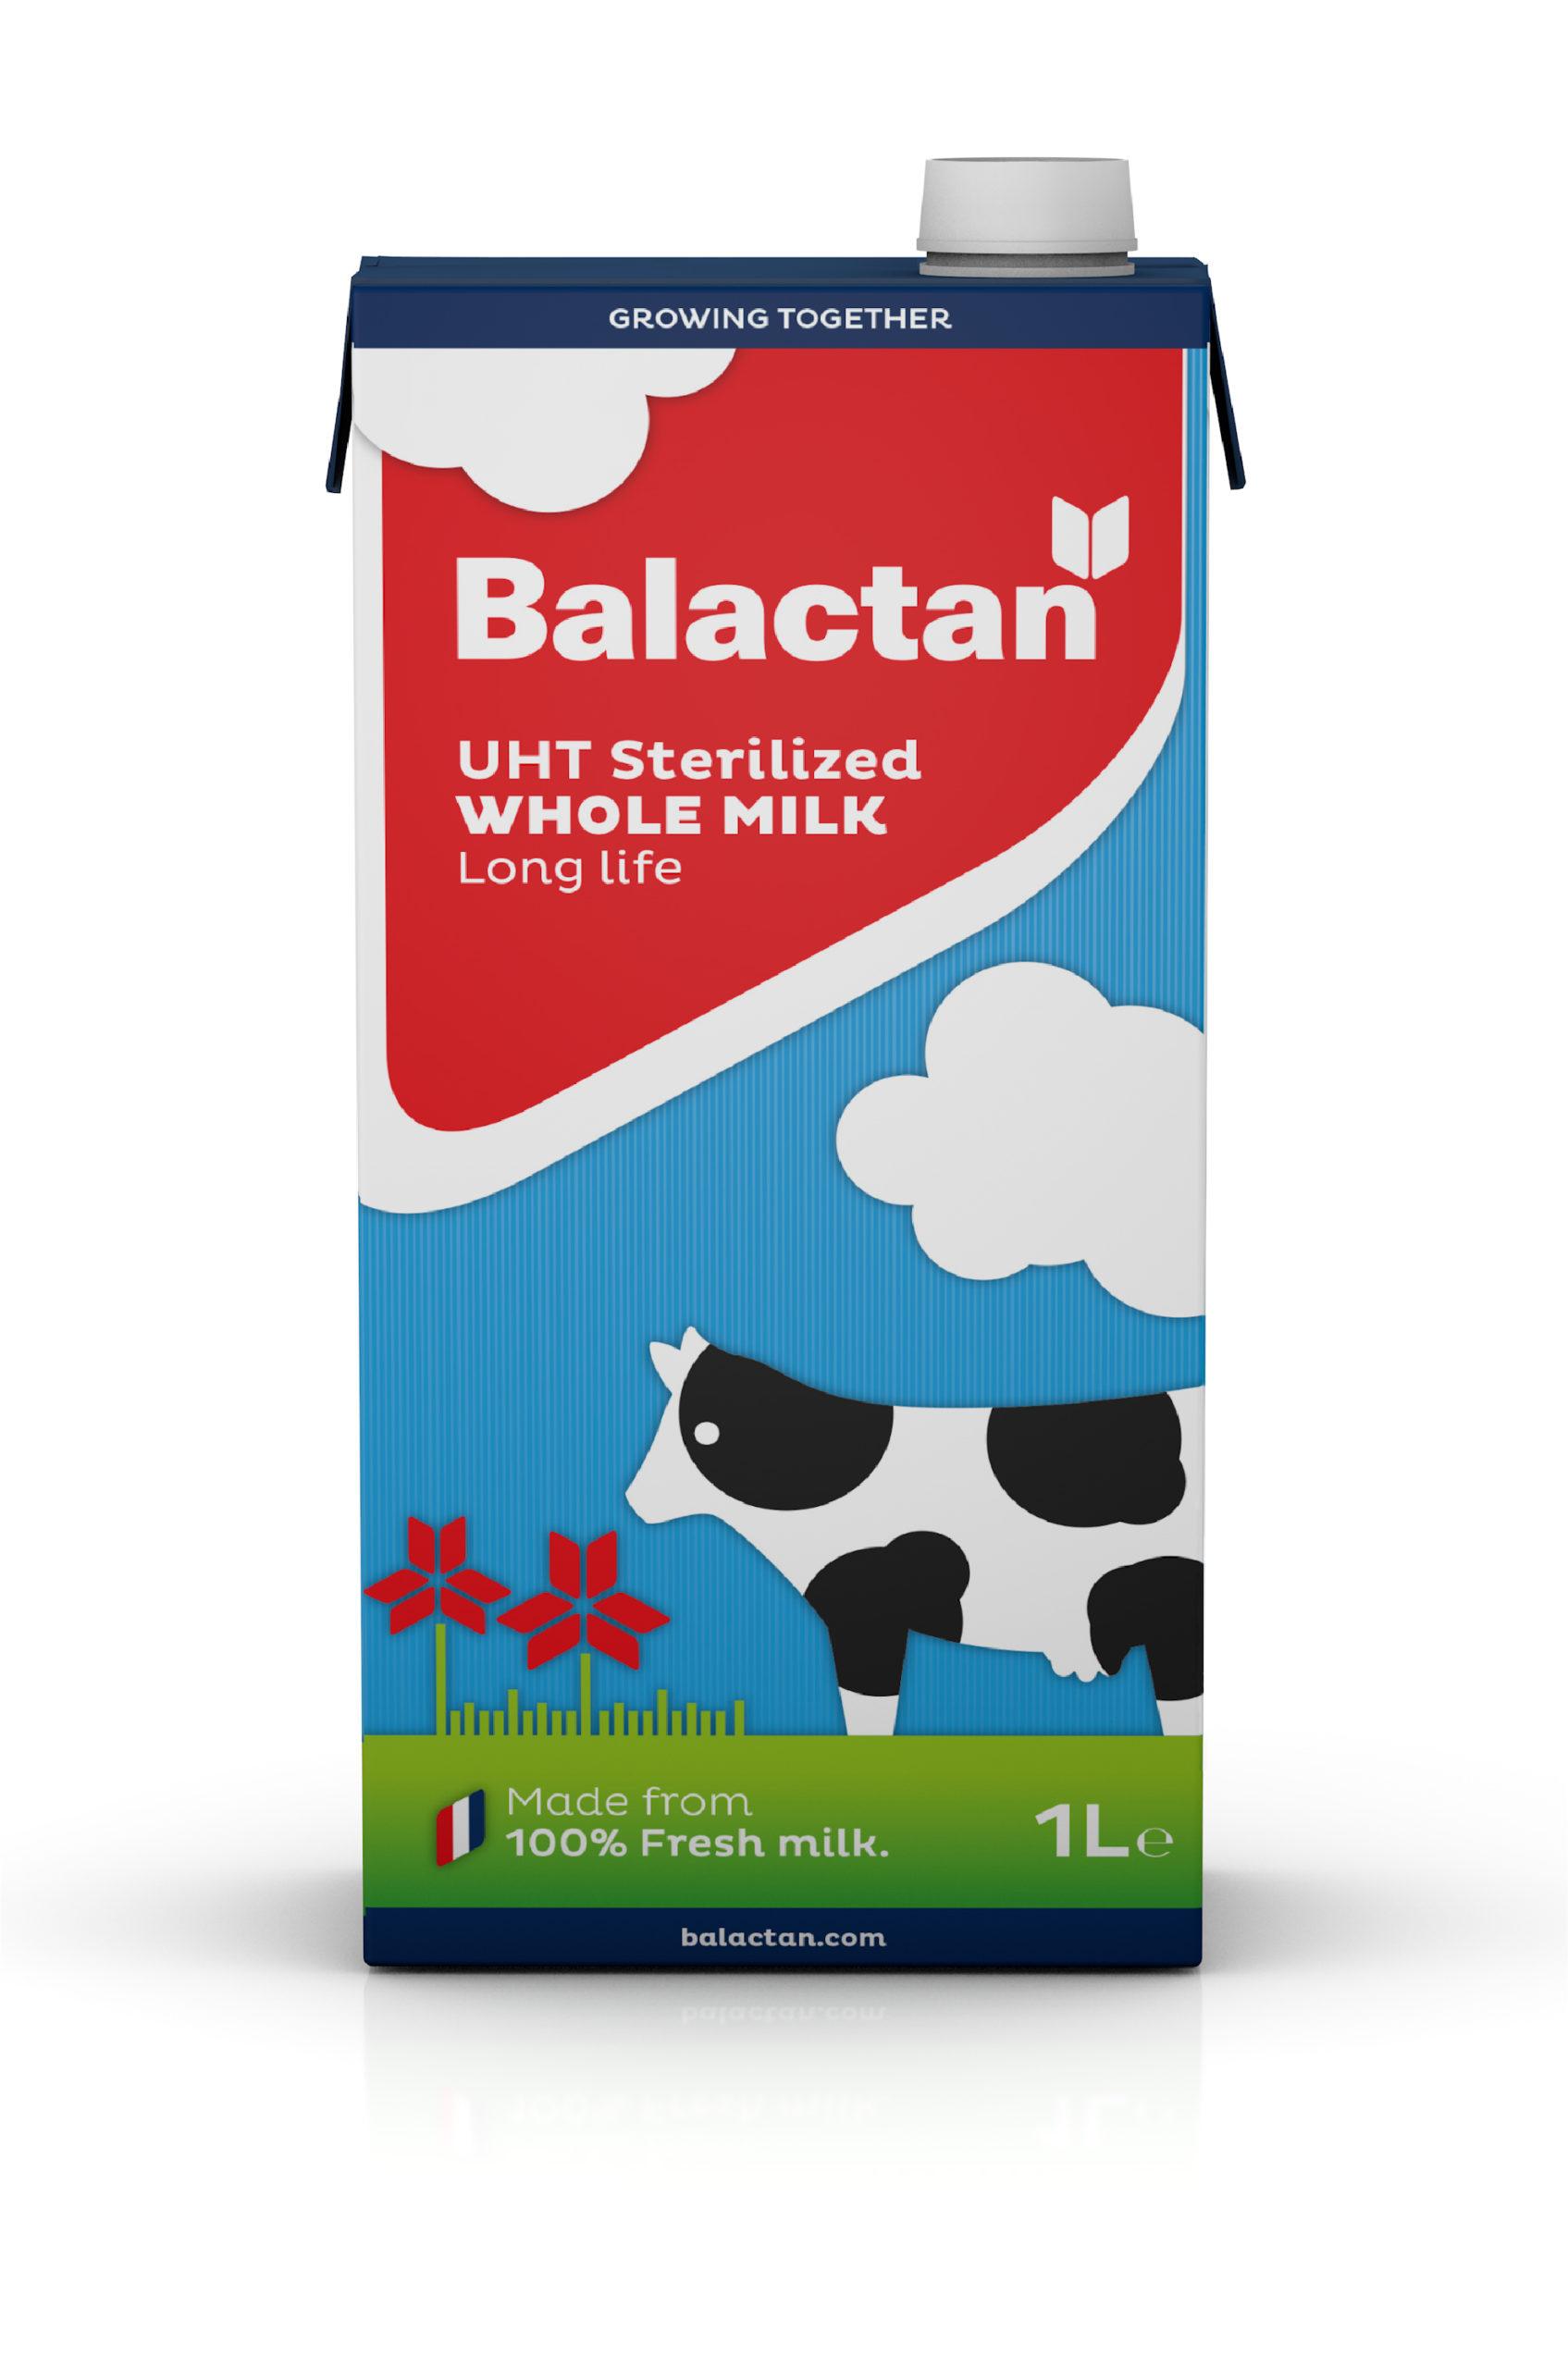 Branding Y Packaging_alimentación Infantil_leche UHT_Balactan